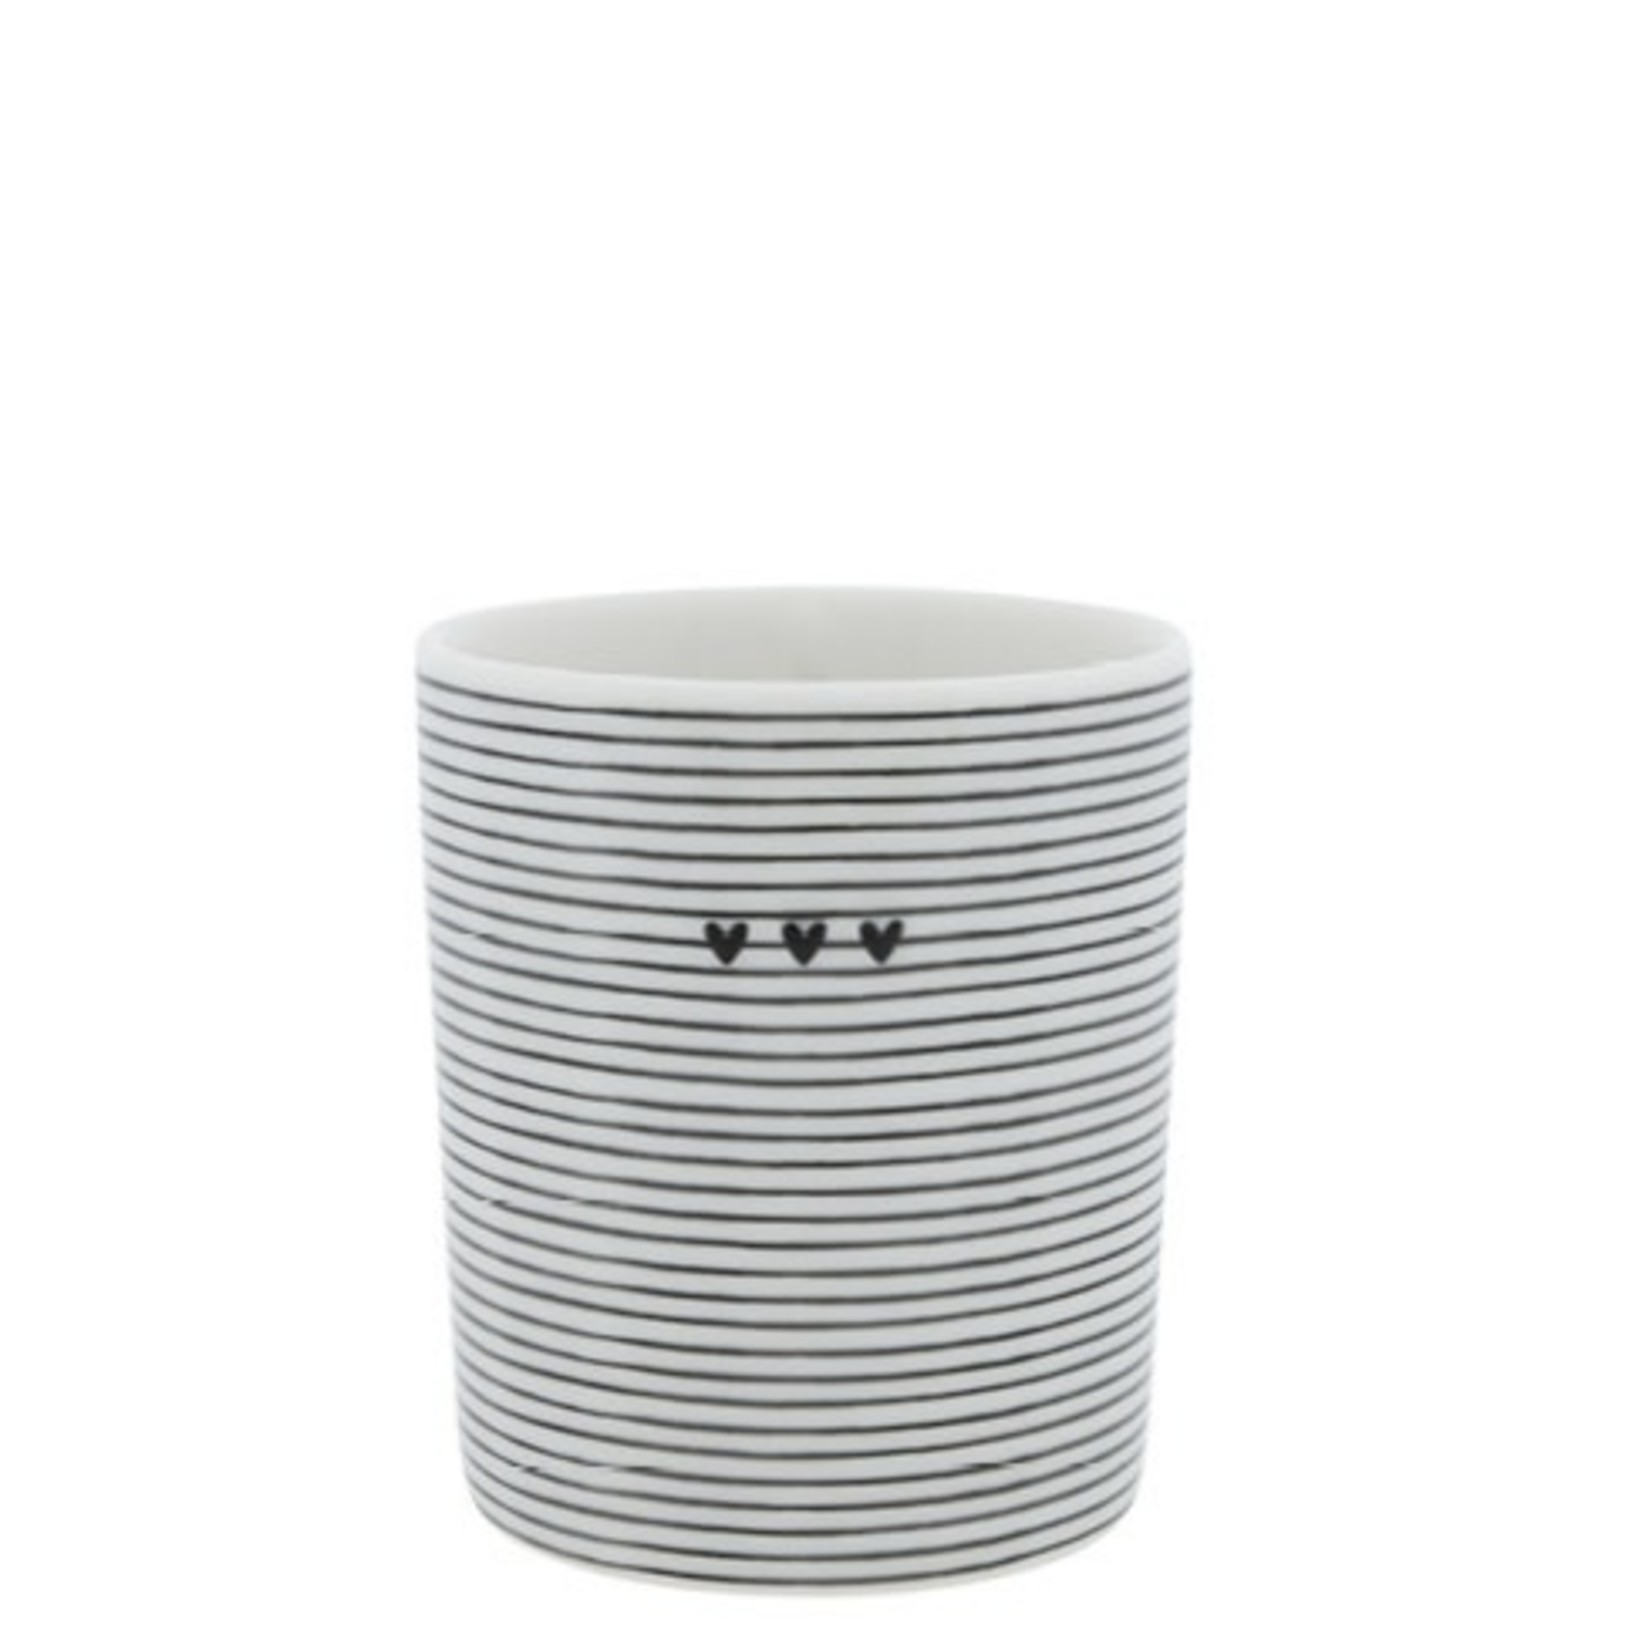 Bastion Collections Mug stripes/3 hearts white/black 8x8x9 cm